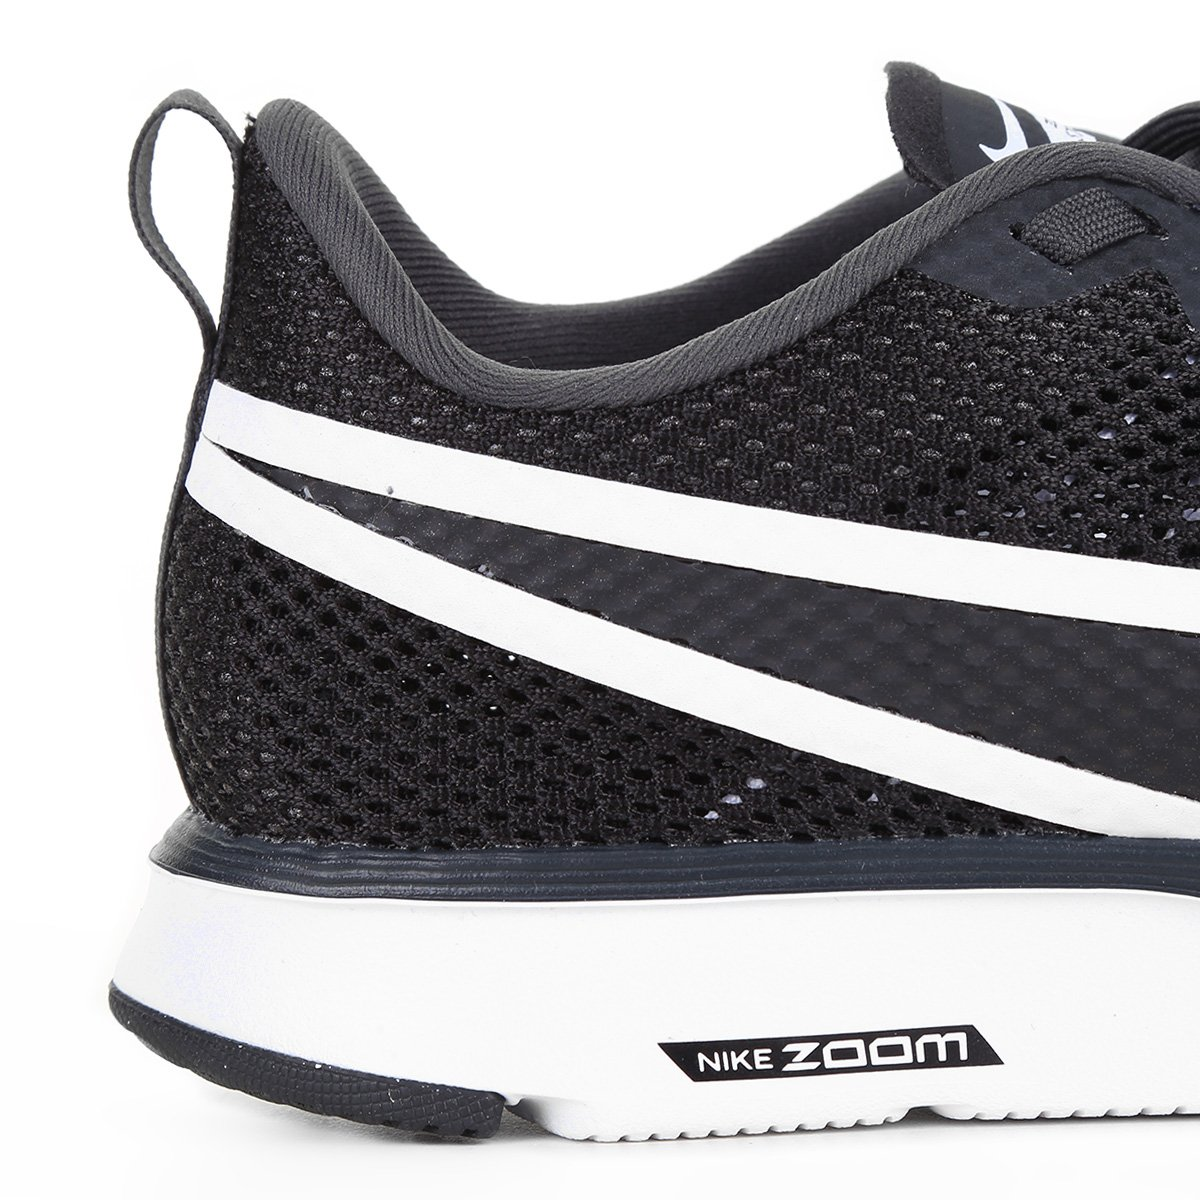 Tênis Nike Zoom Strike 2 Masculino - Preto e Branco - Compre Agora ... 9526e026f24f8